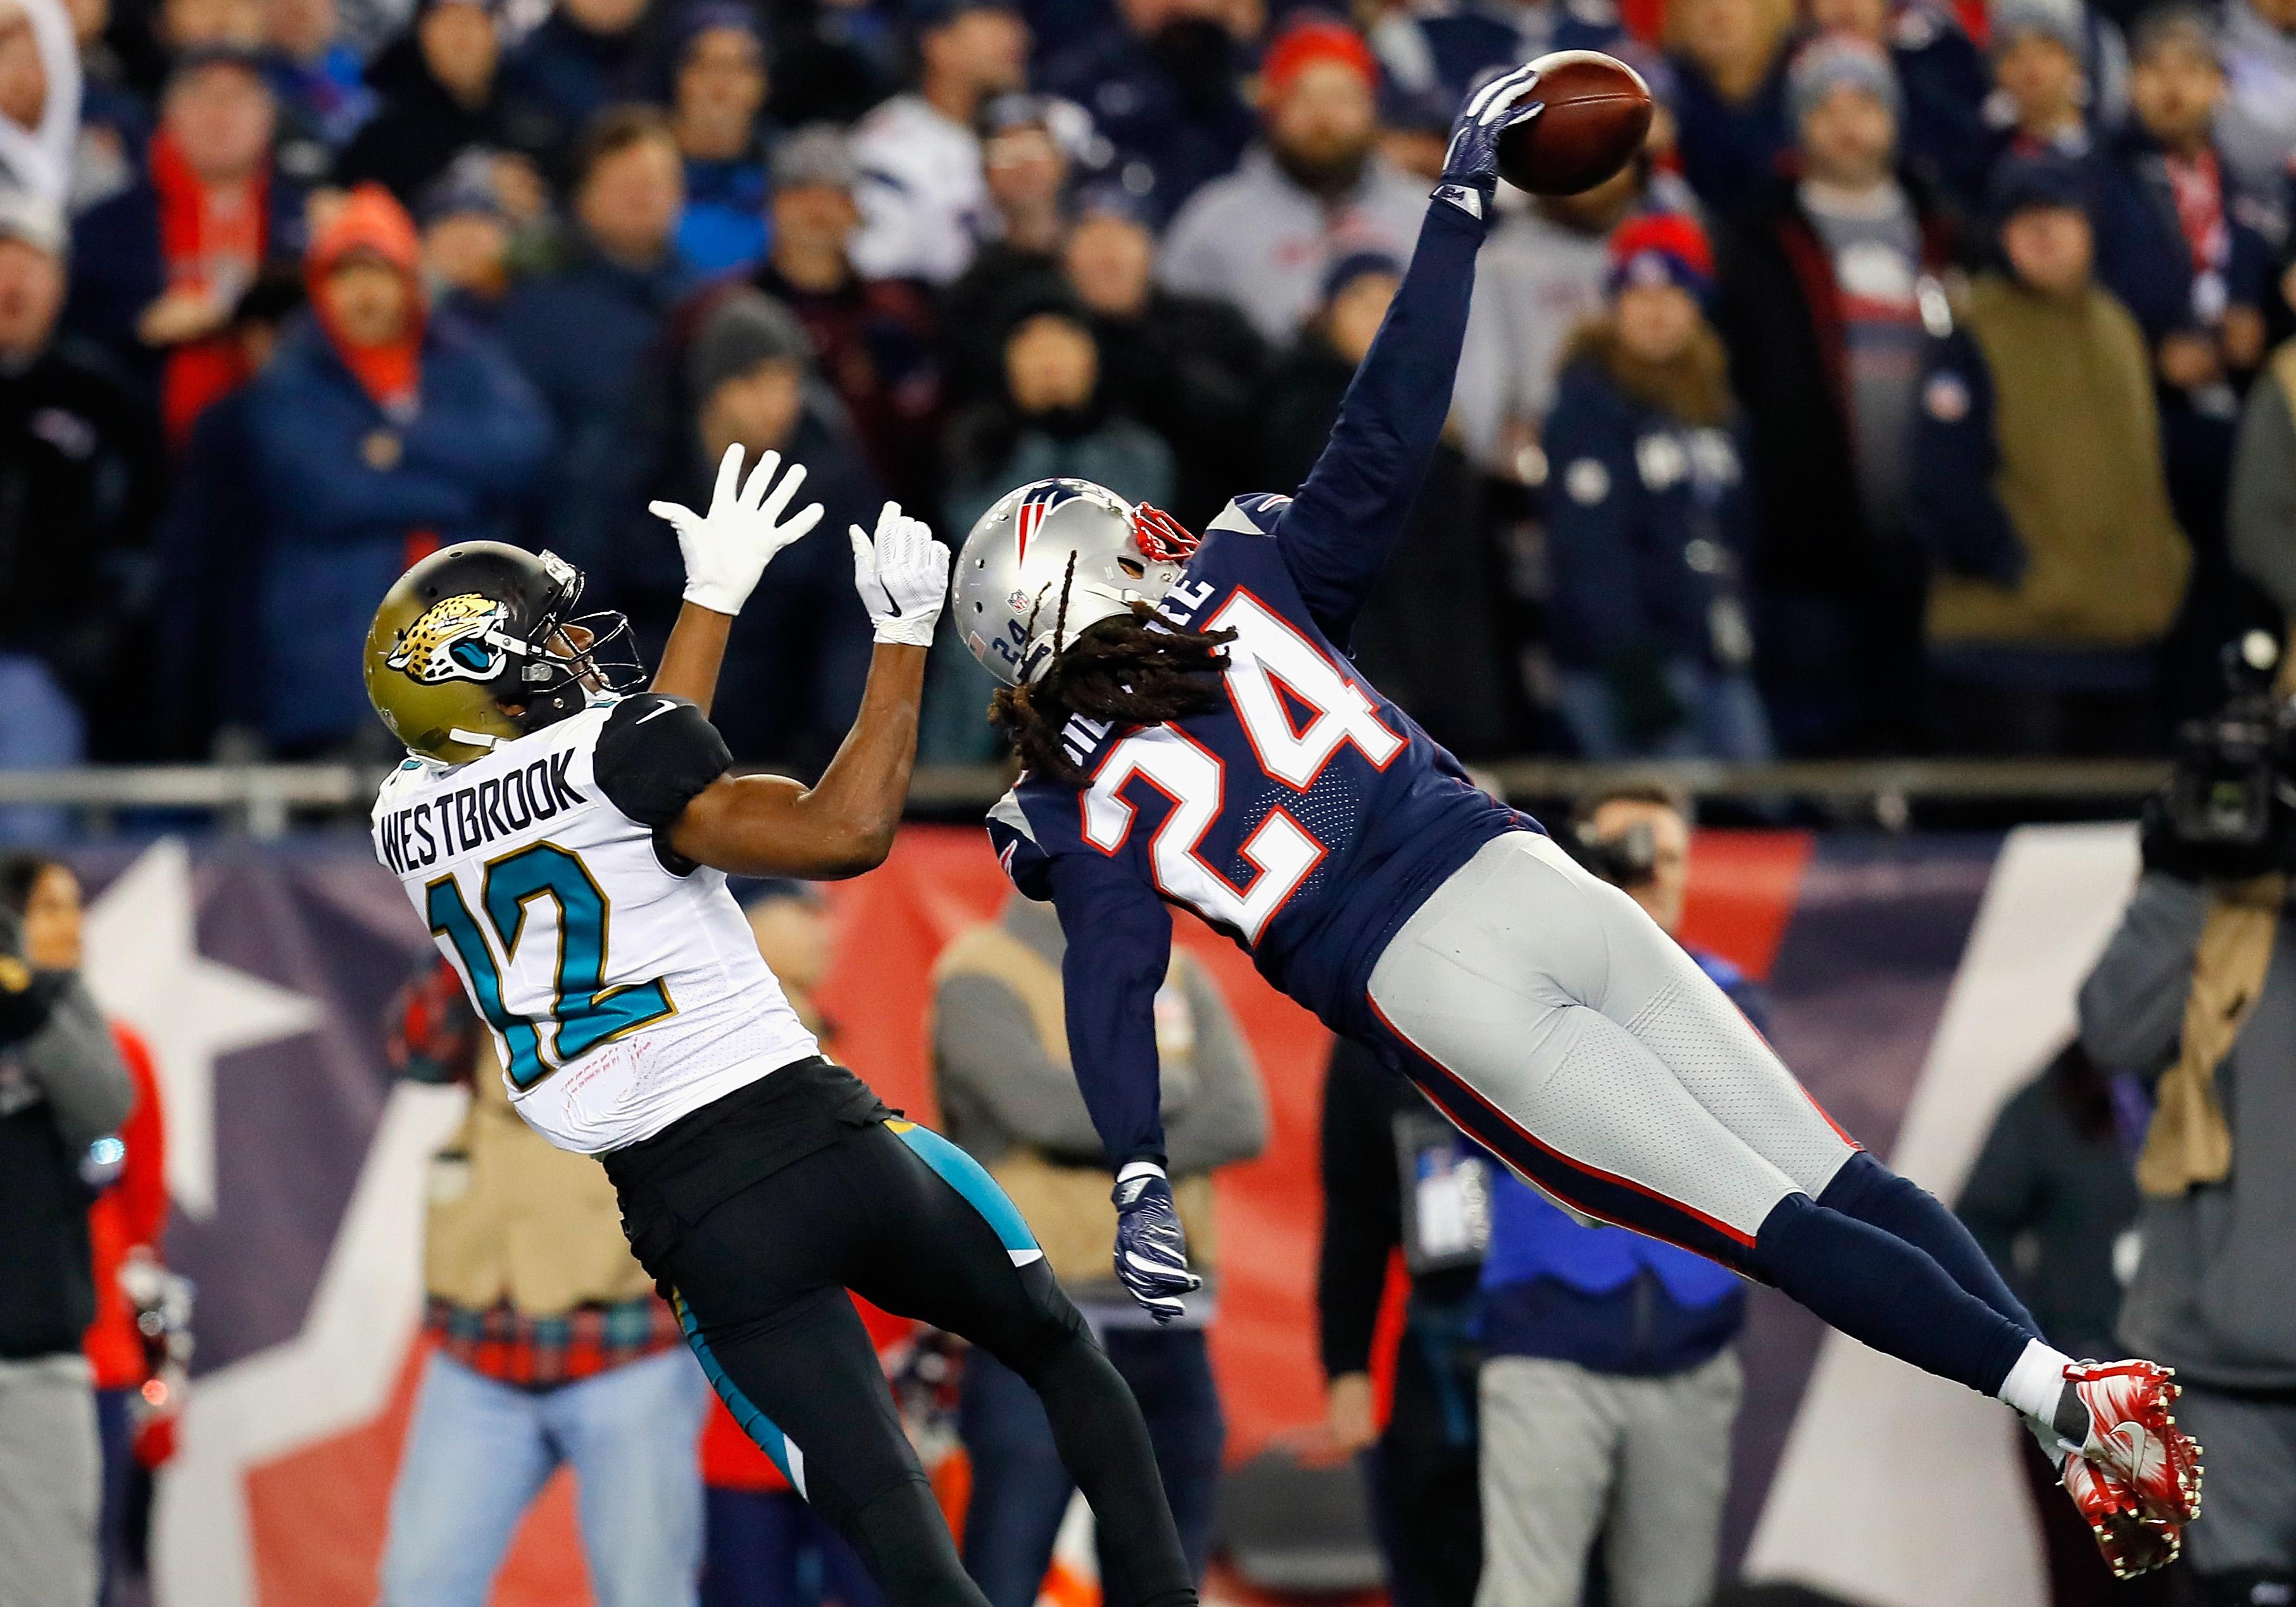 Jaguars vs. Patriots: Highlights, game tracker from AFC Championship